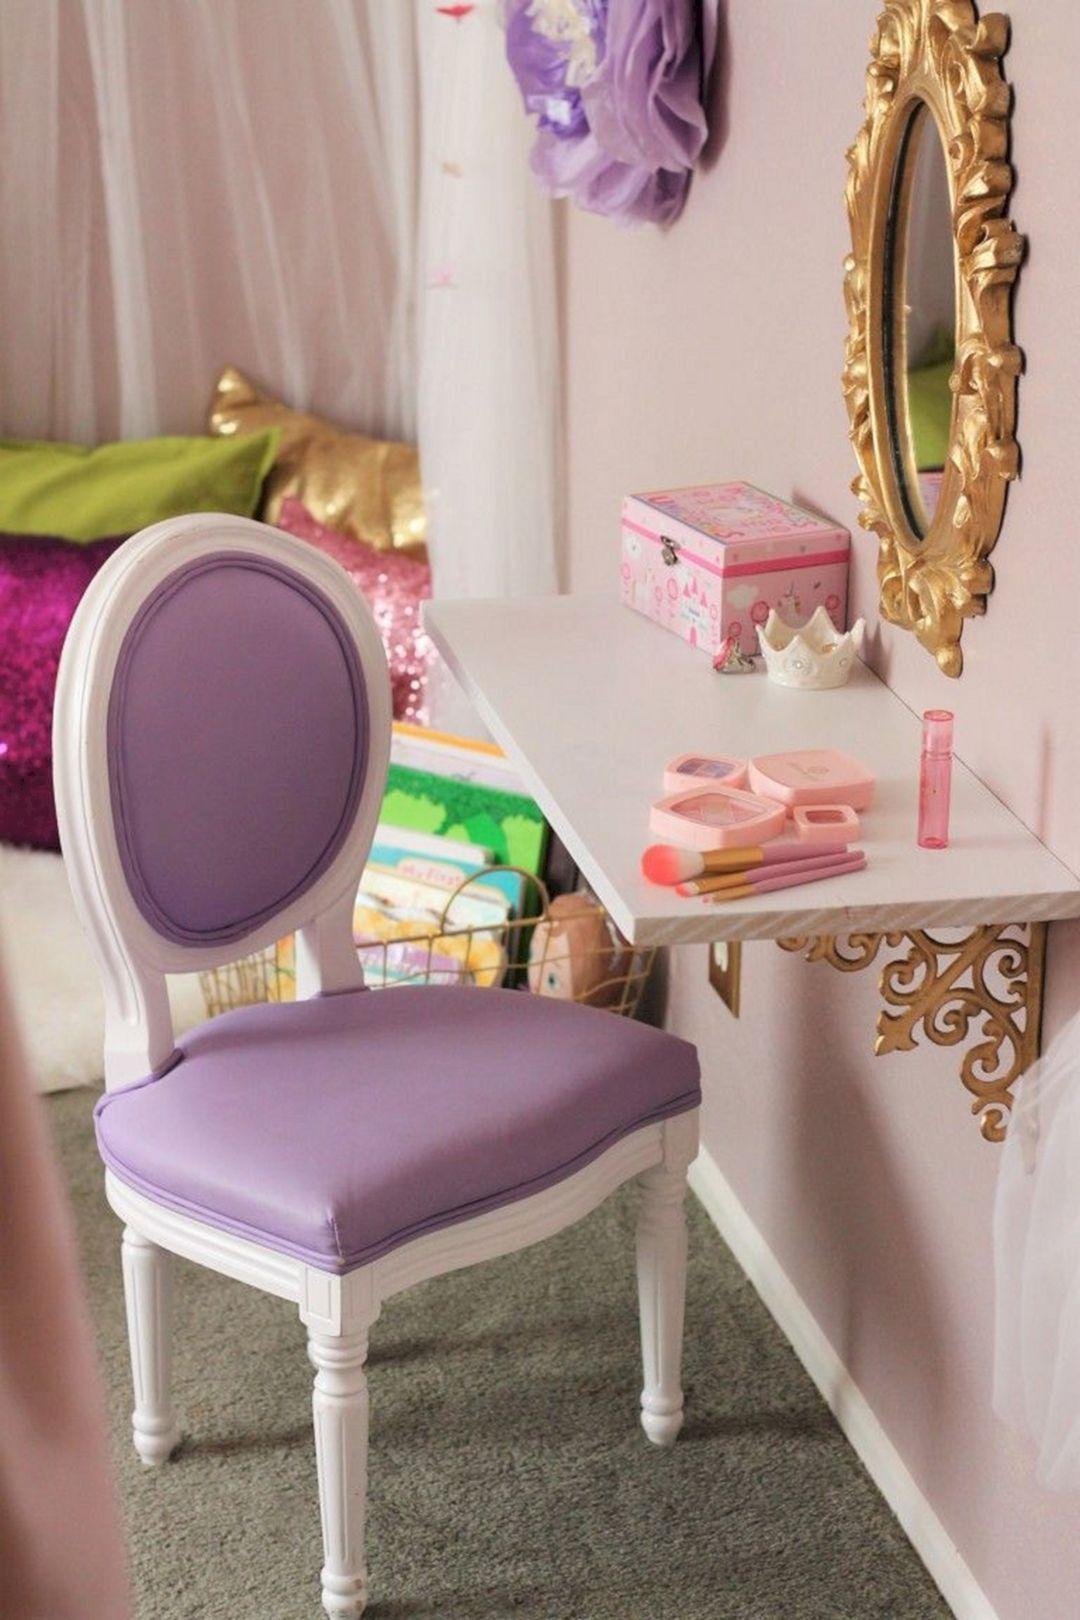 Best Baby Girl Room Design: 65+ Sweetest Baby Girl Room Ideas